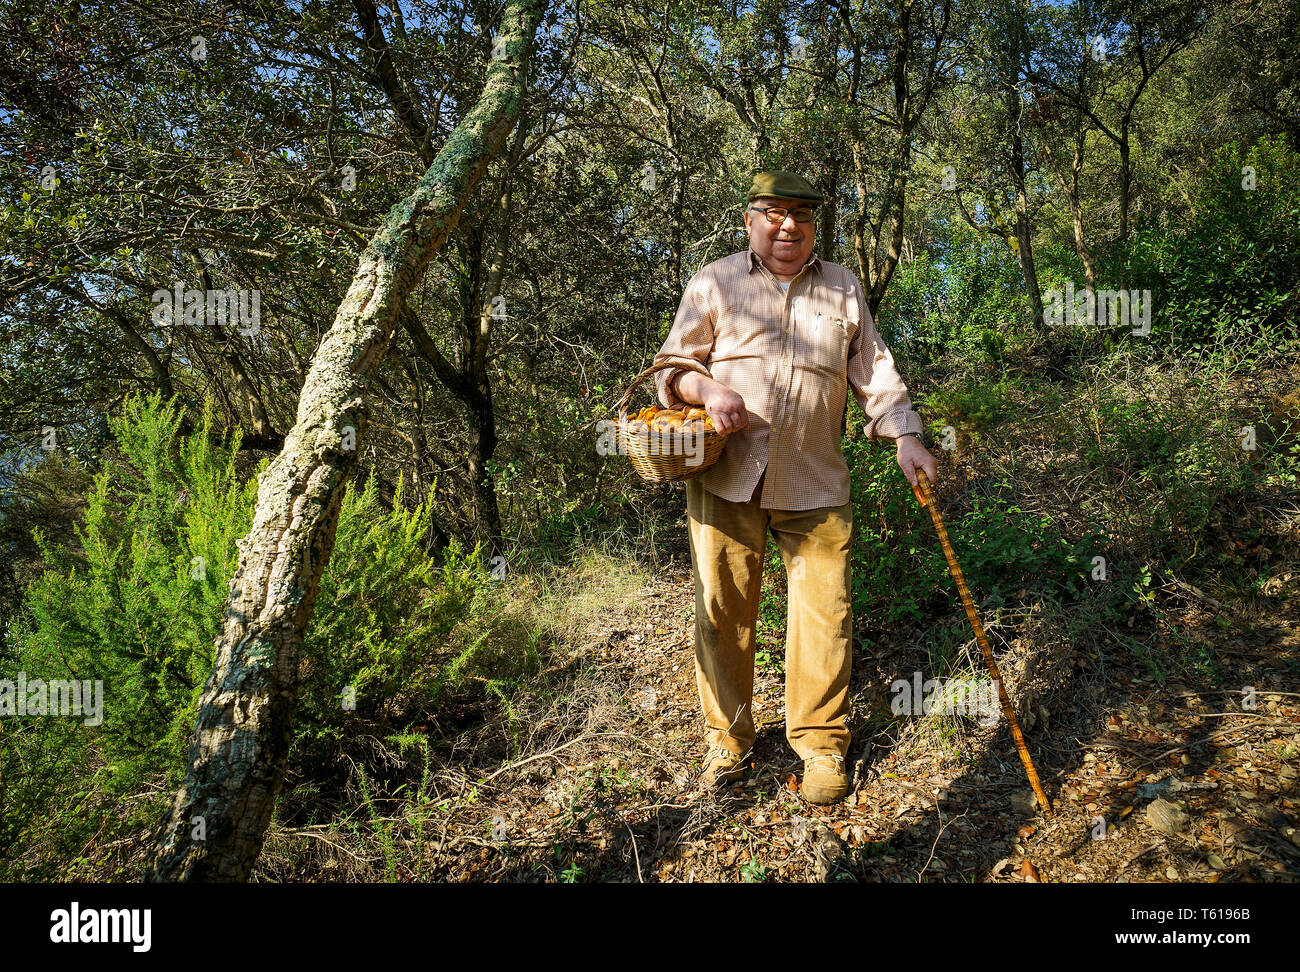 Bolataire, cueilleurs de champignons, Pineda de Mar. Catalunya. Espagne Photo Stock